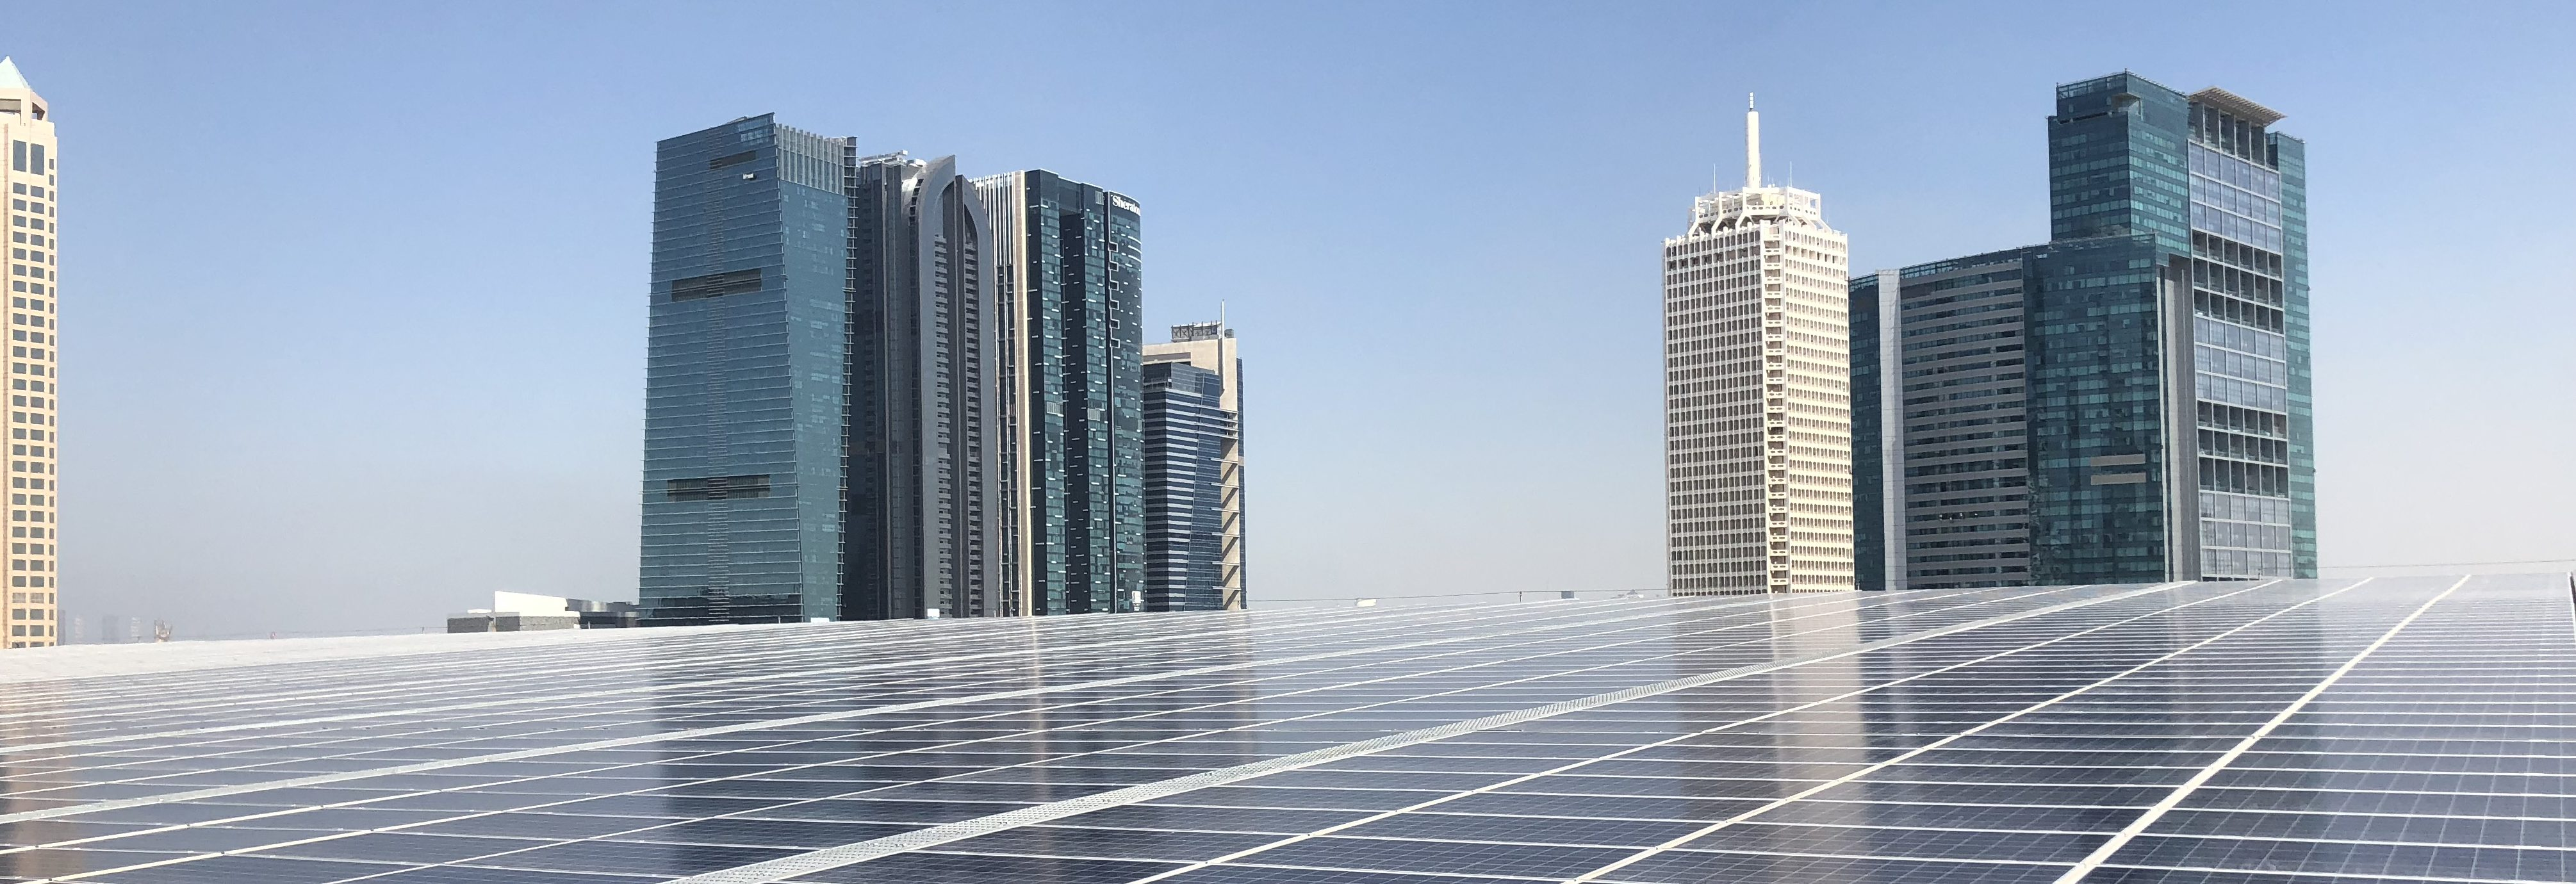 Photovoltaic Plant Project - Dubai World Trade Center1